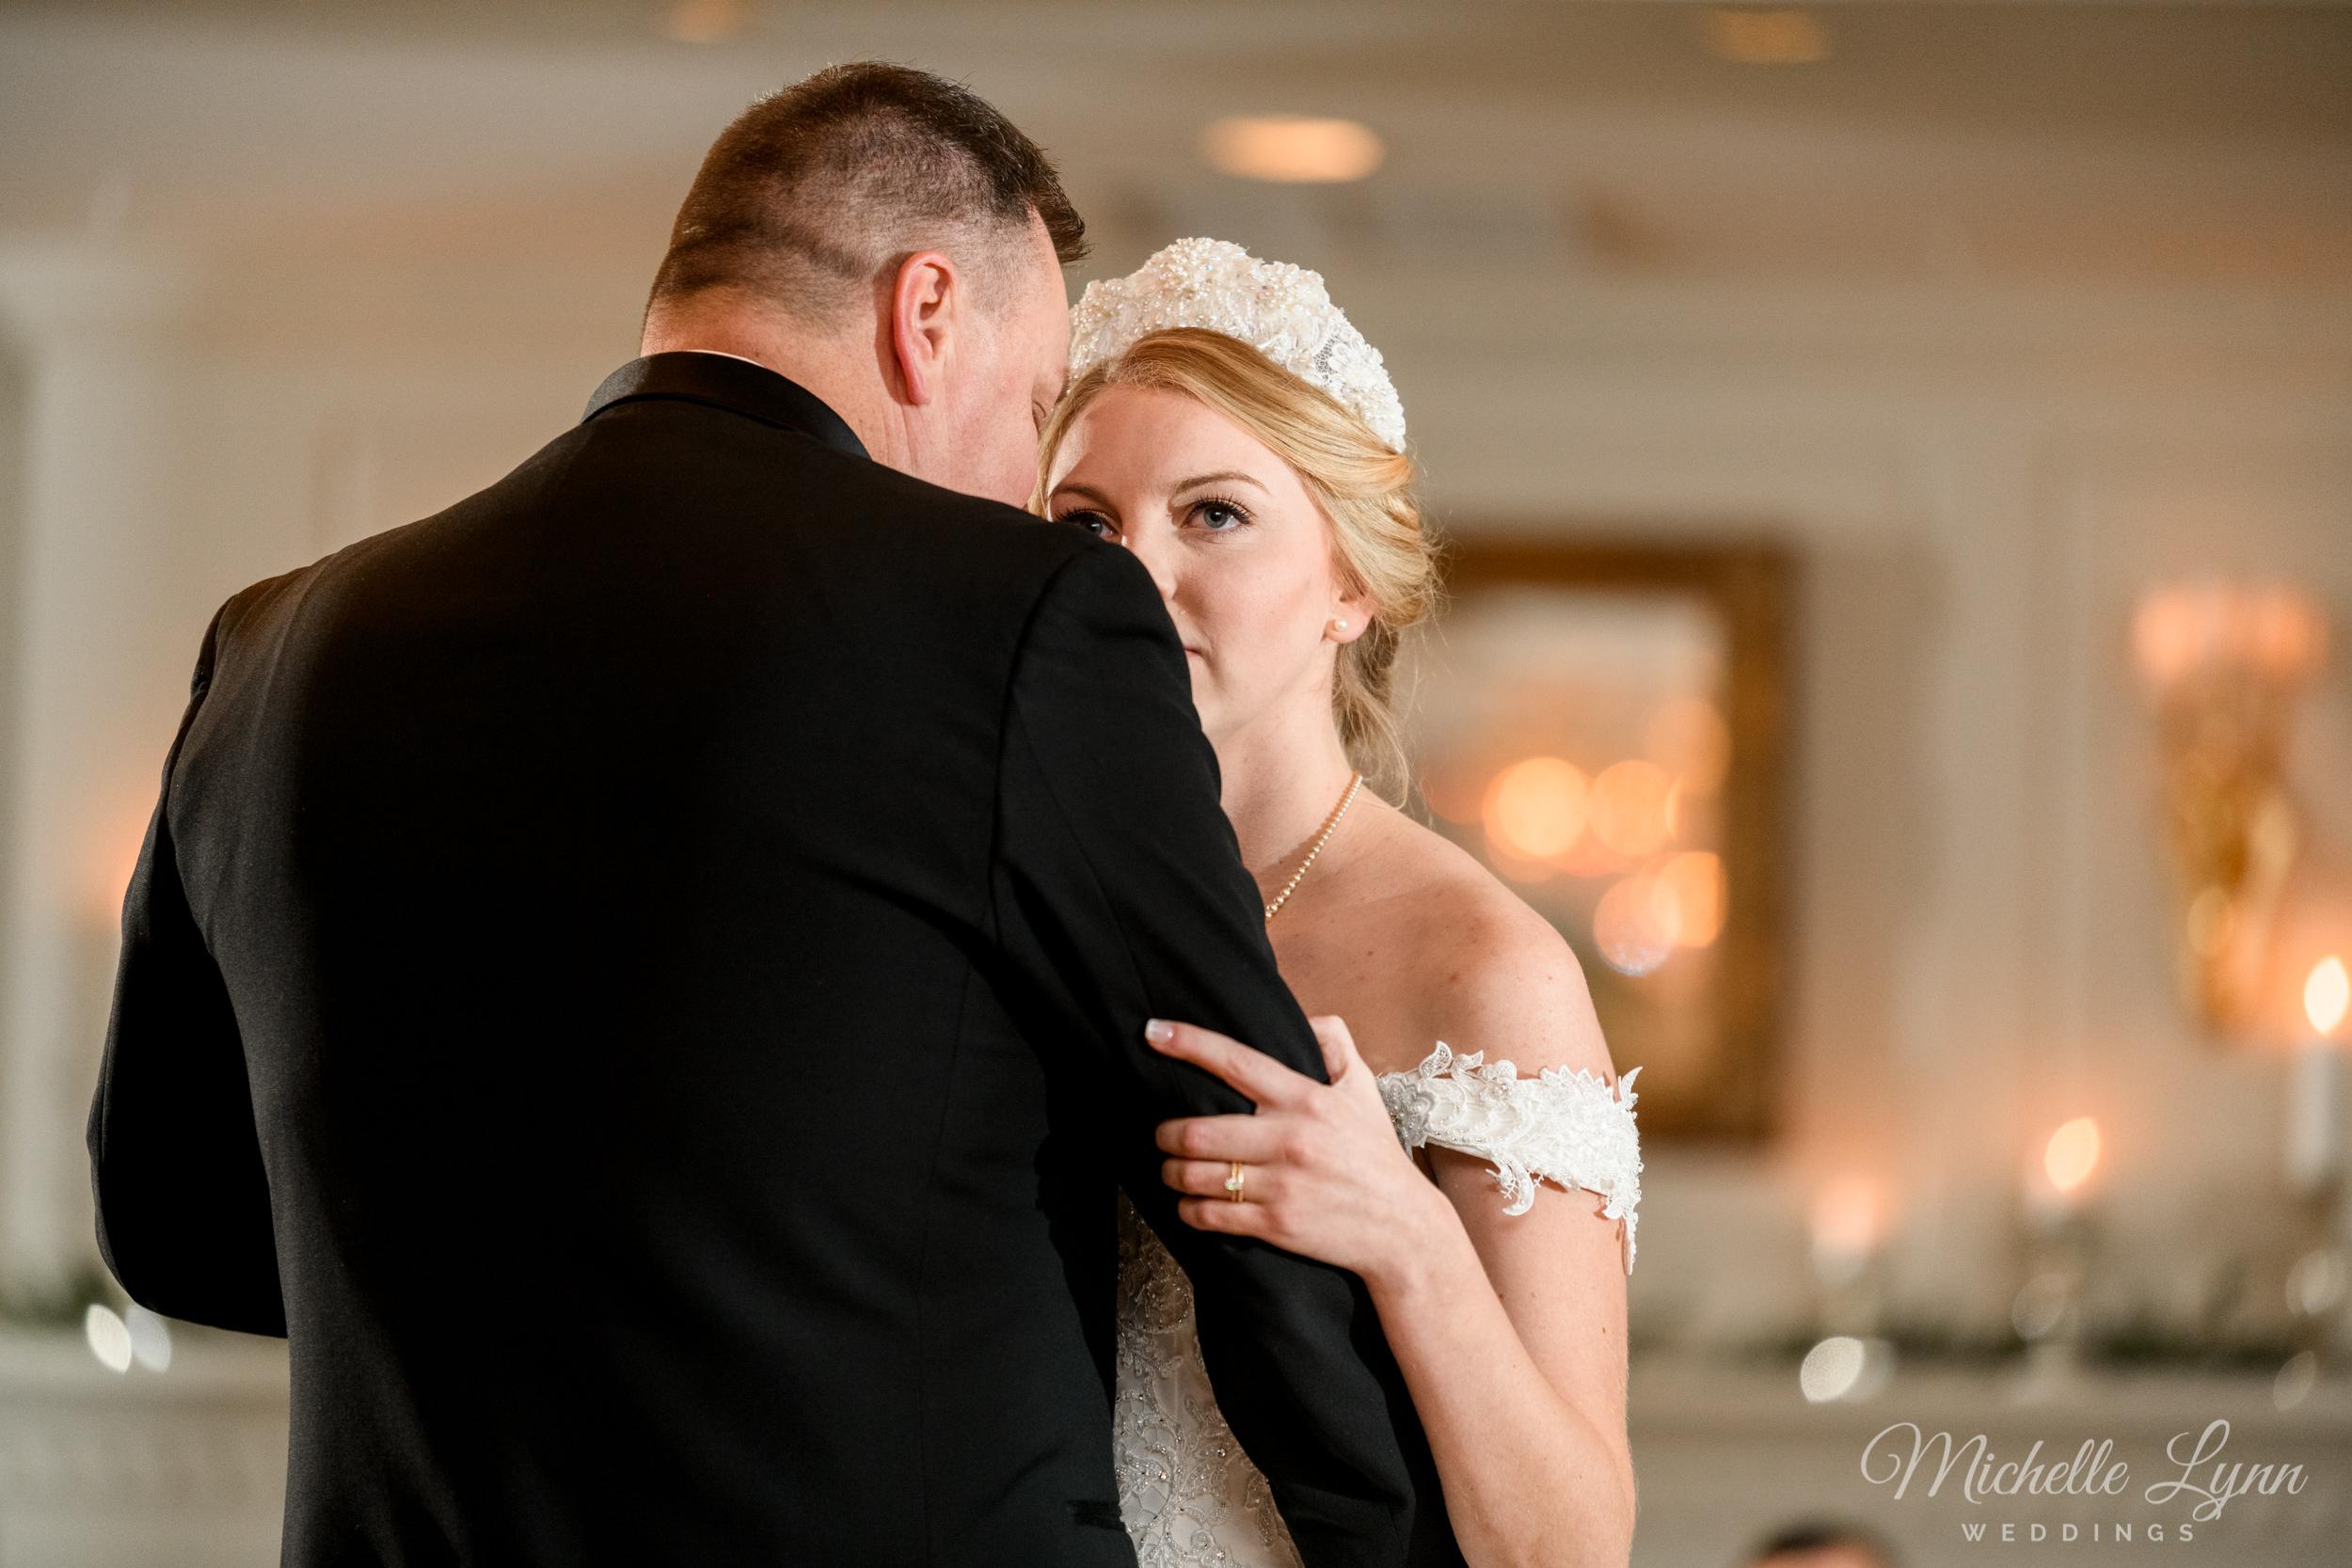 william-penn-inn-wedding-photography-mlw-94.jpg